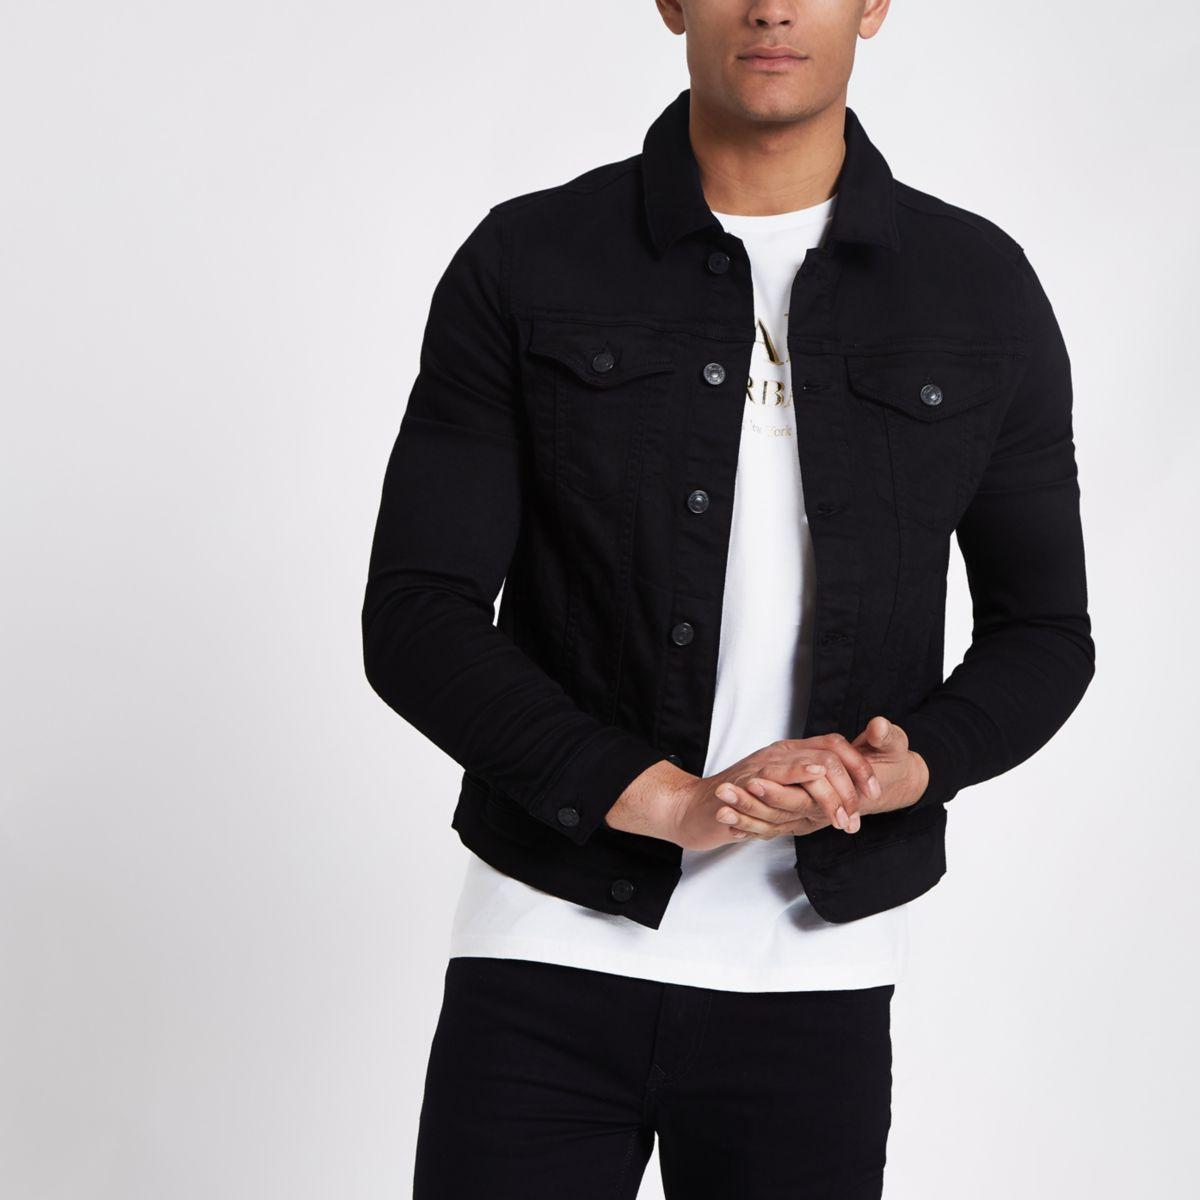 Veste en jean noir moulante